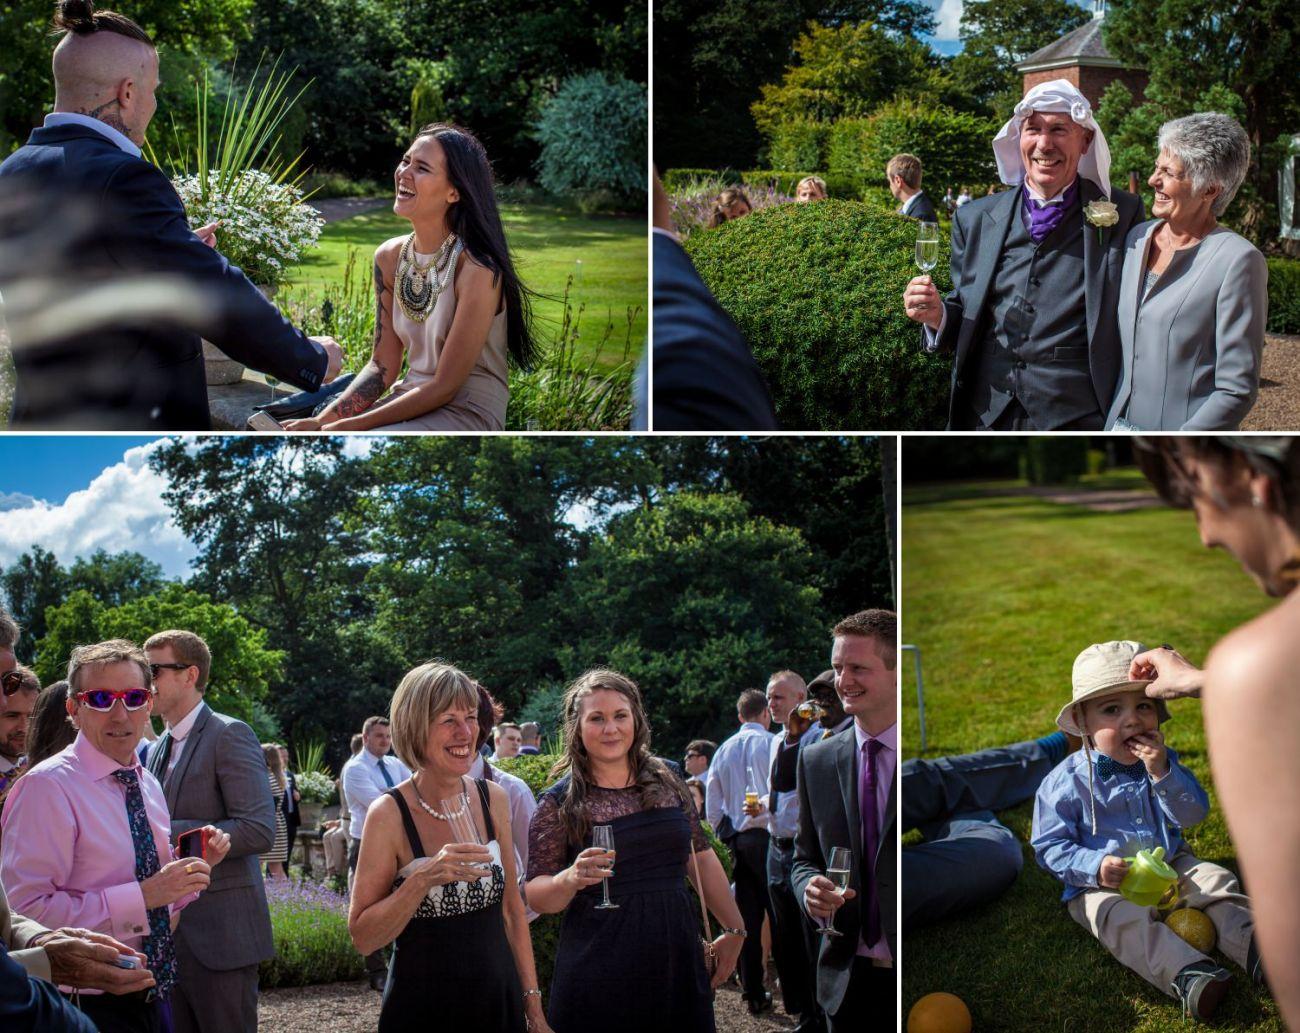 Wedding Photography guests having fun at Iscoyd Park